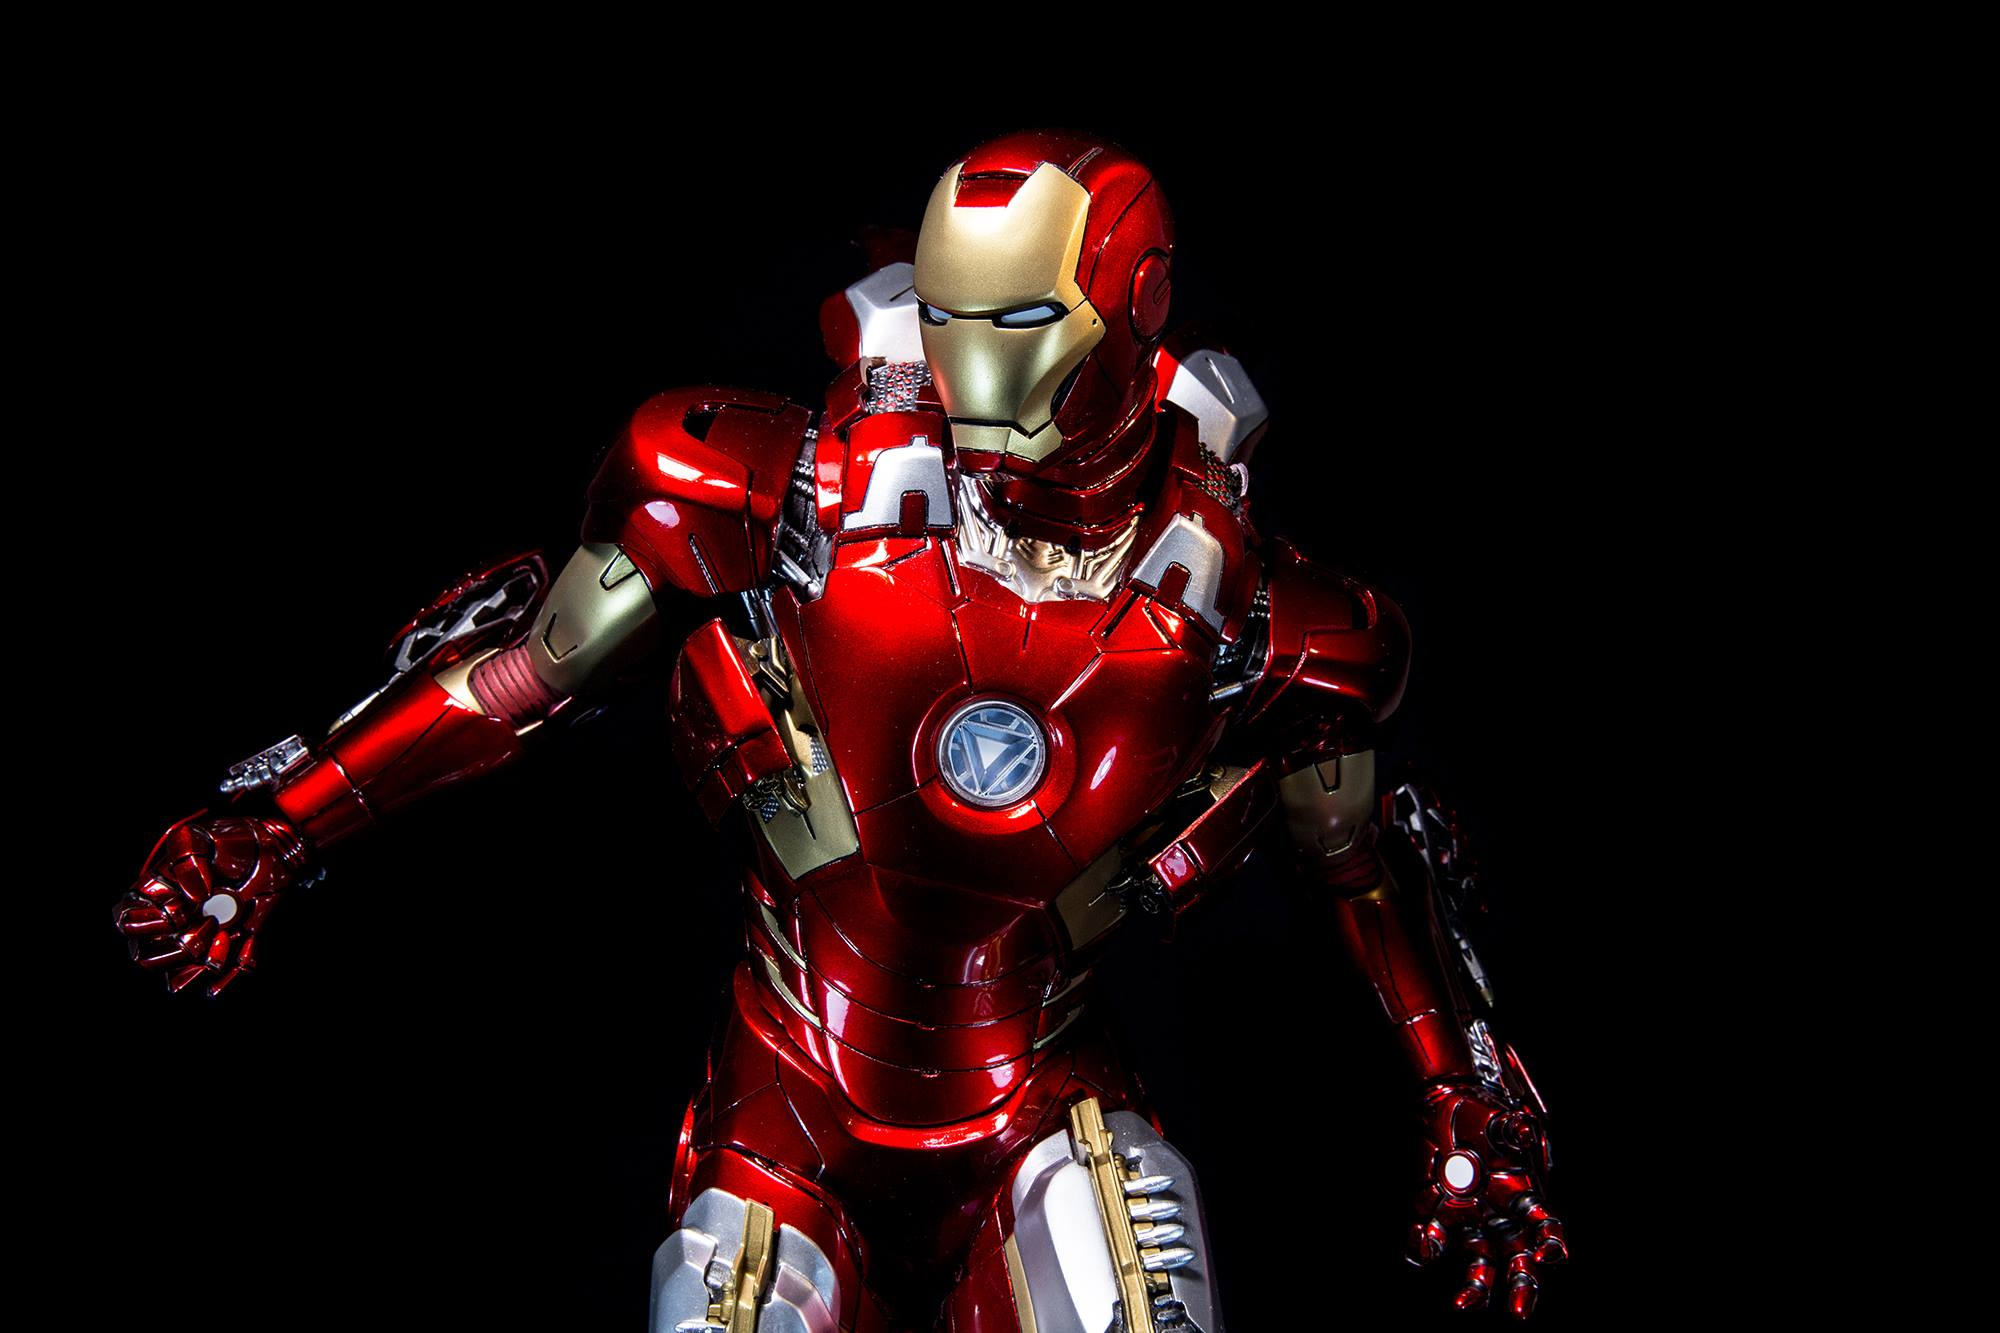 Premium Collectibles : Iron man MK VII - Page 2 7273241053576514035865665287055180426726897701503o